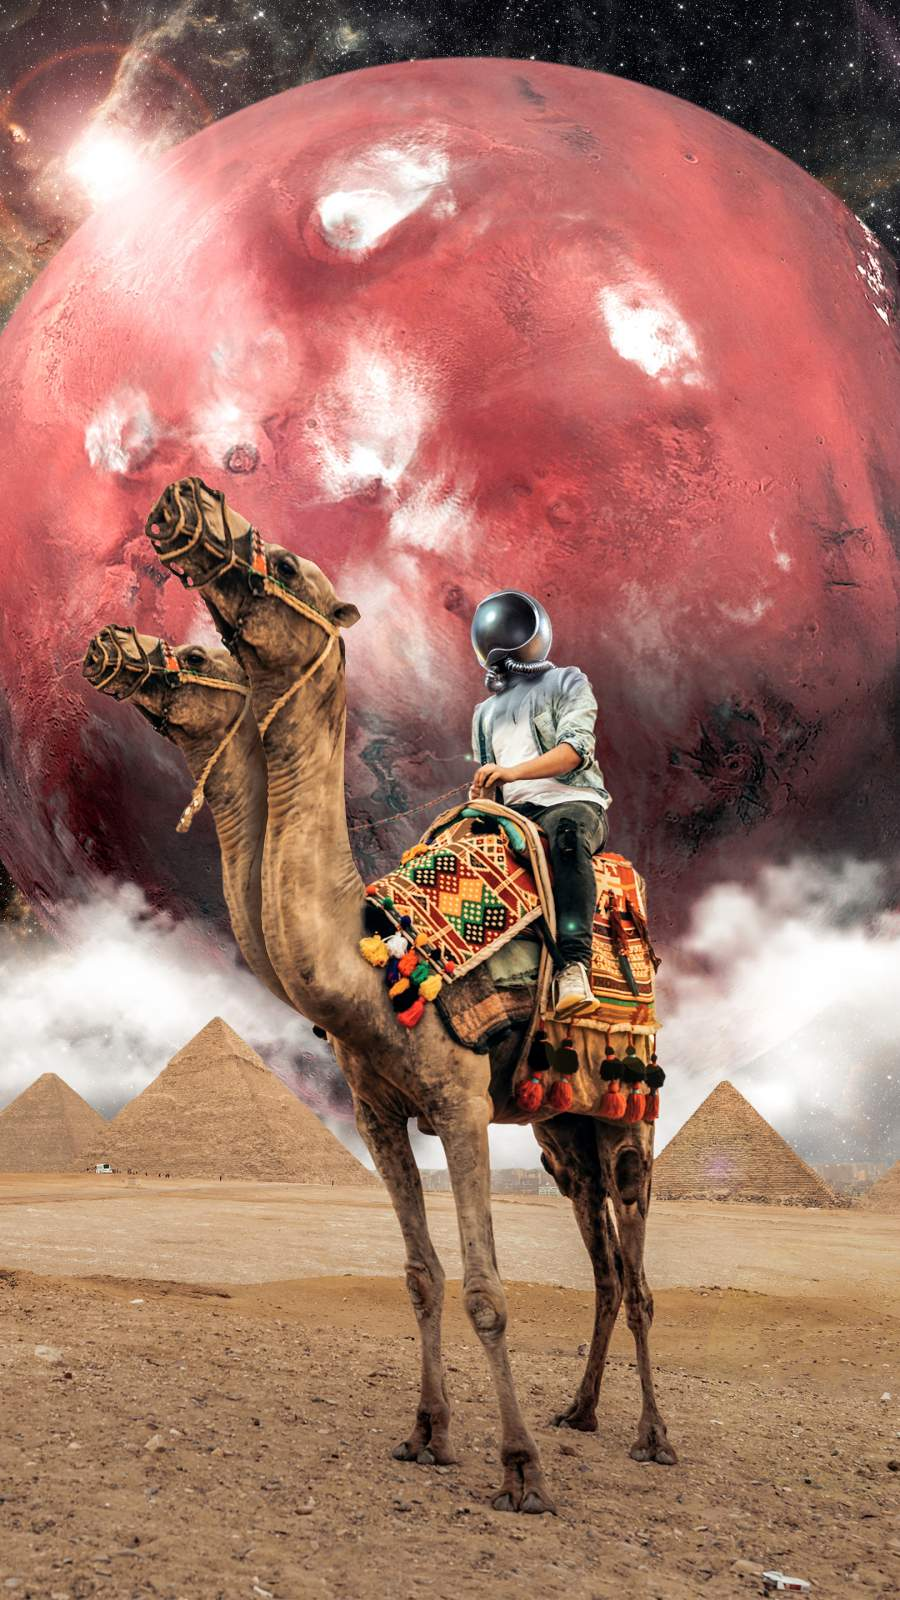 Camel Astronaut iPhone Wallpaper